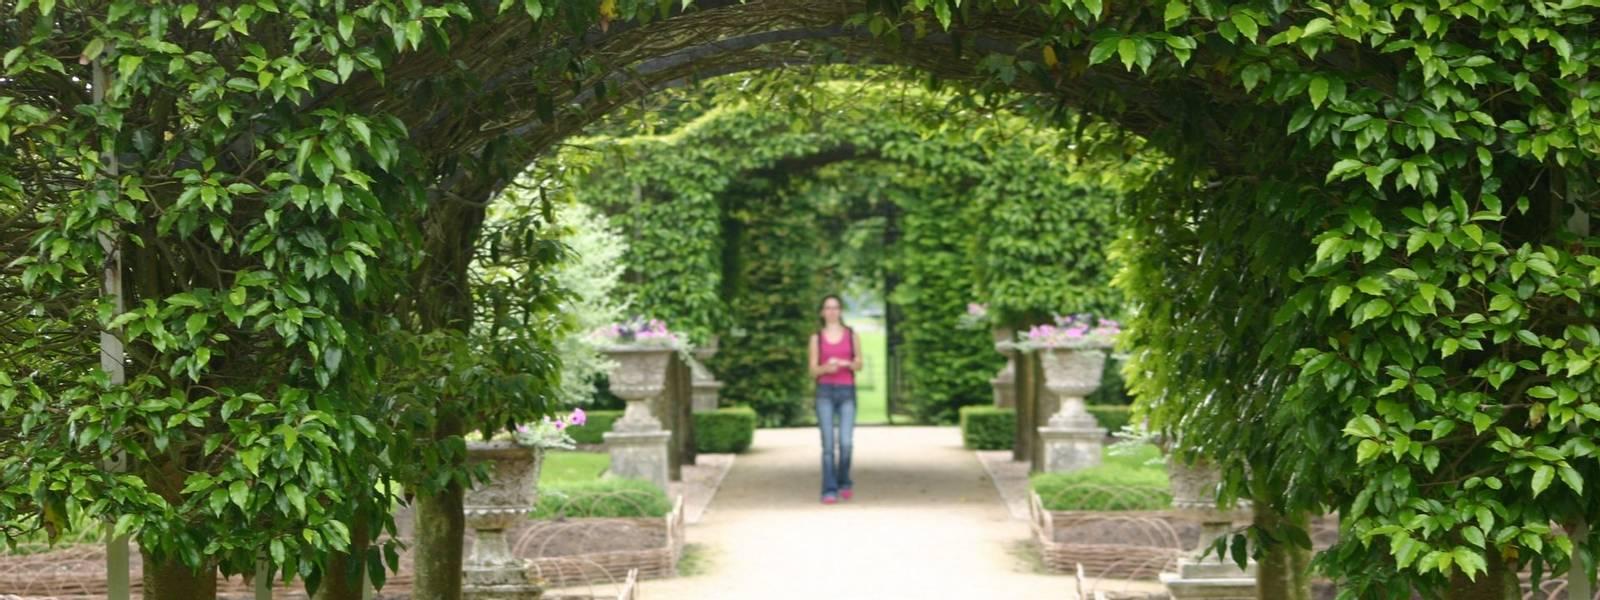 HorticulturalTours-GardenToursAdobeStock_2461376.jpeg